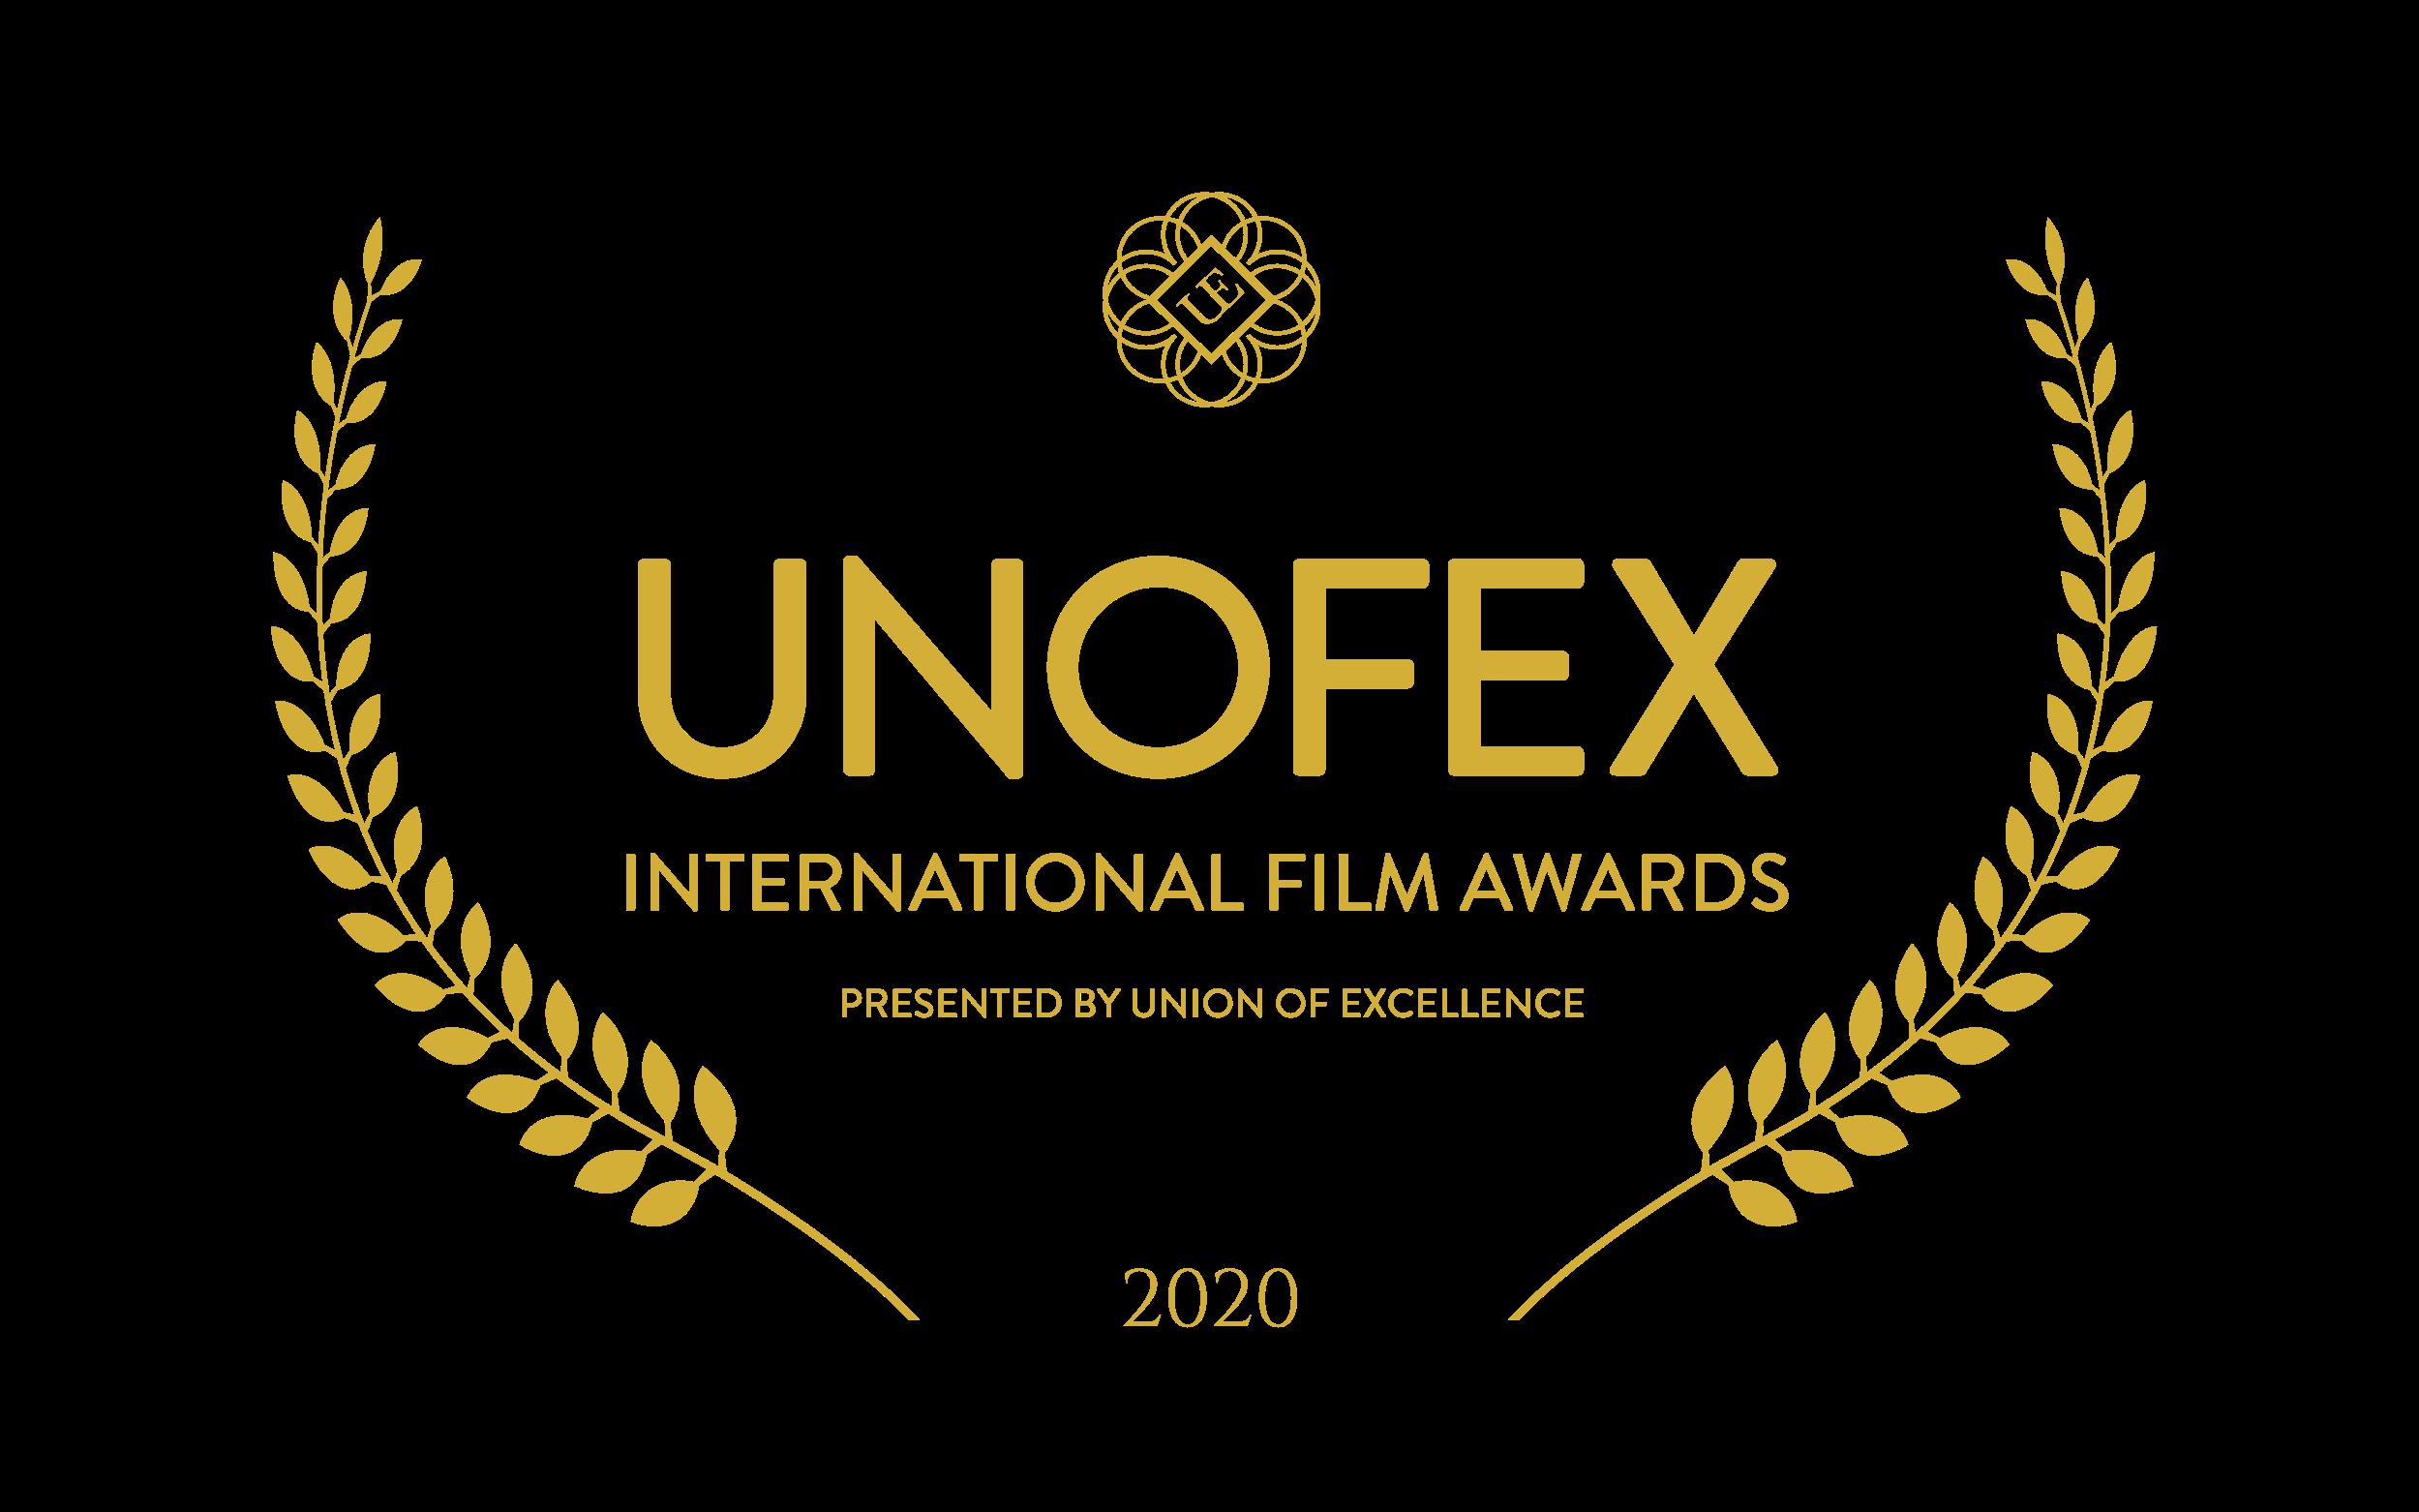 UNOFEX International Film Awards 2020 Logo